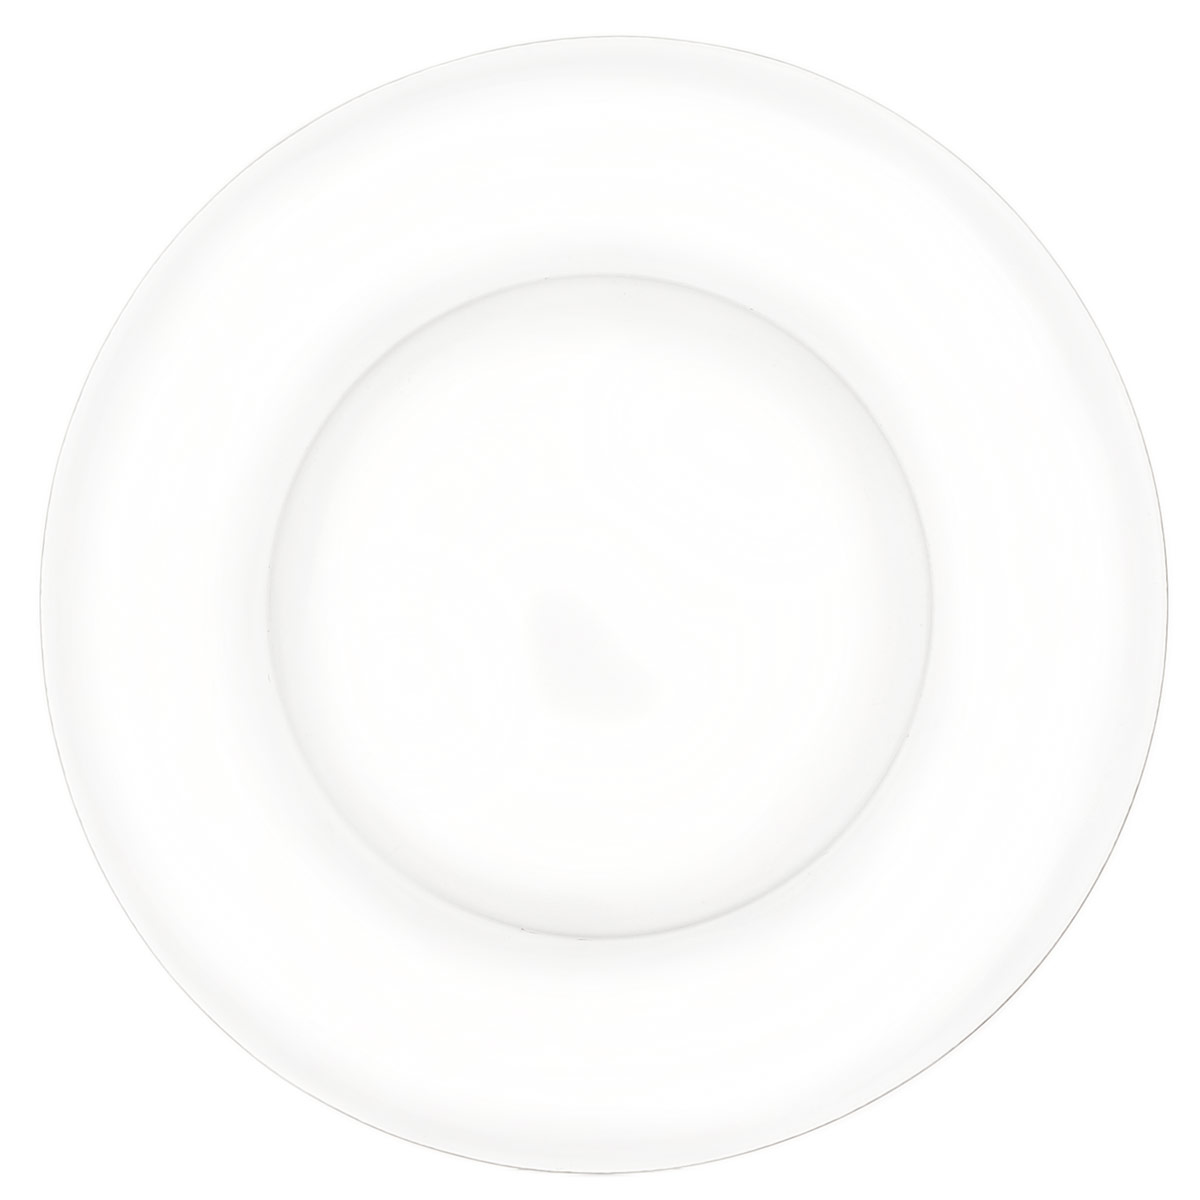 Тарелка обеденная OSZ Симпатия, диаметр 25 см тарелка обеденная terracotta дерево жизни диаметр 26 см